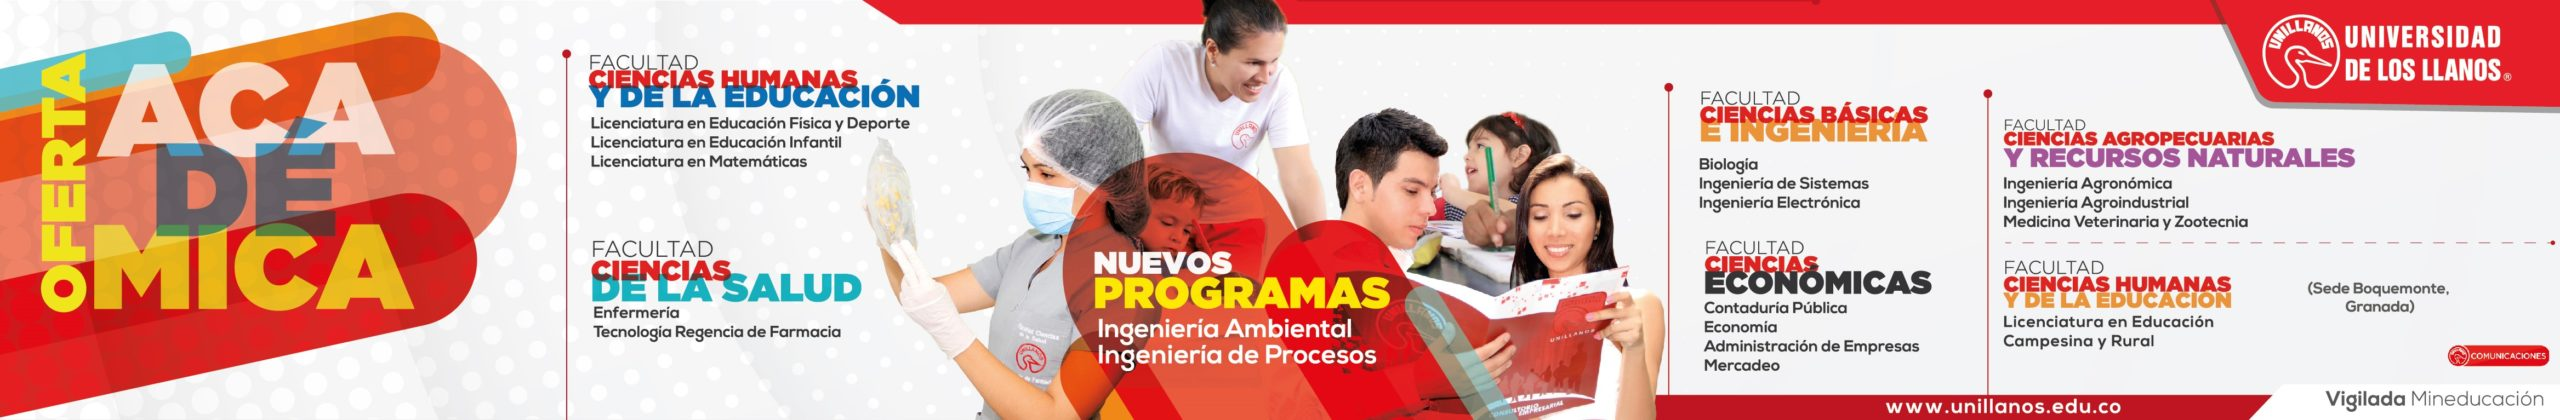 Oferta Académica Unillanos